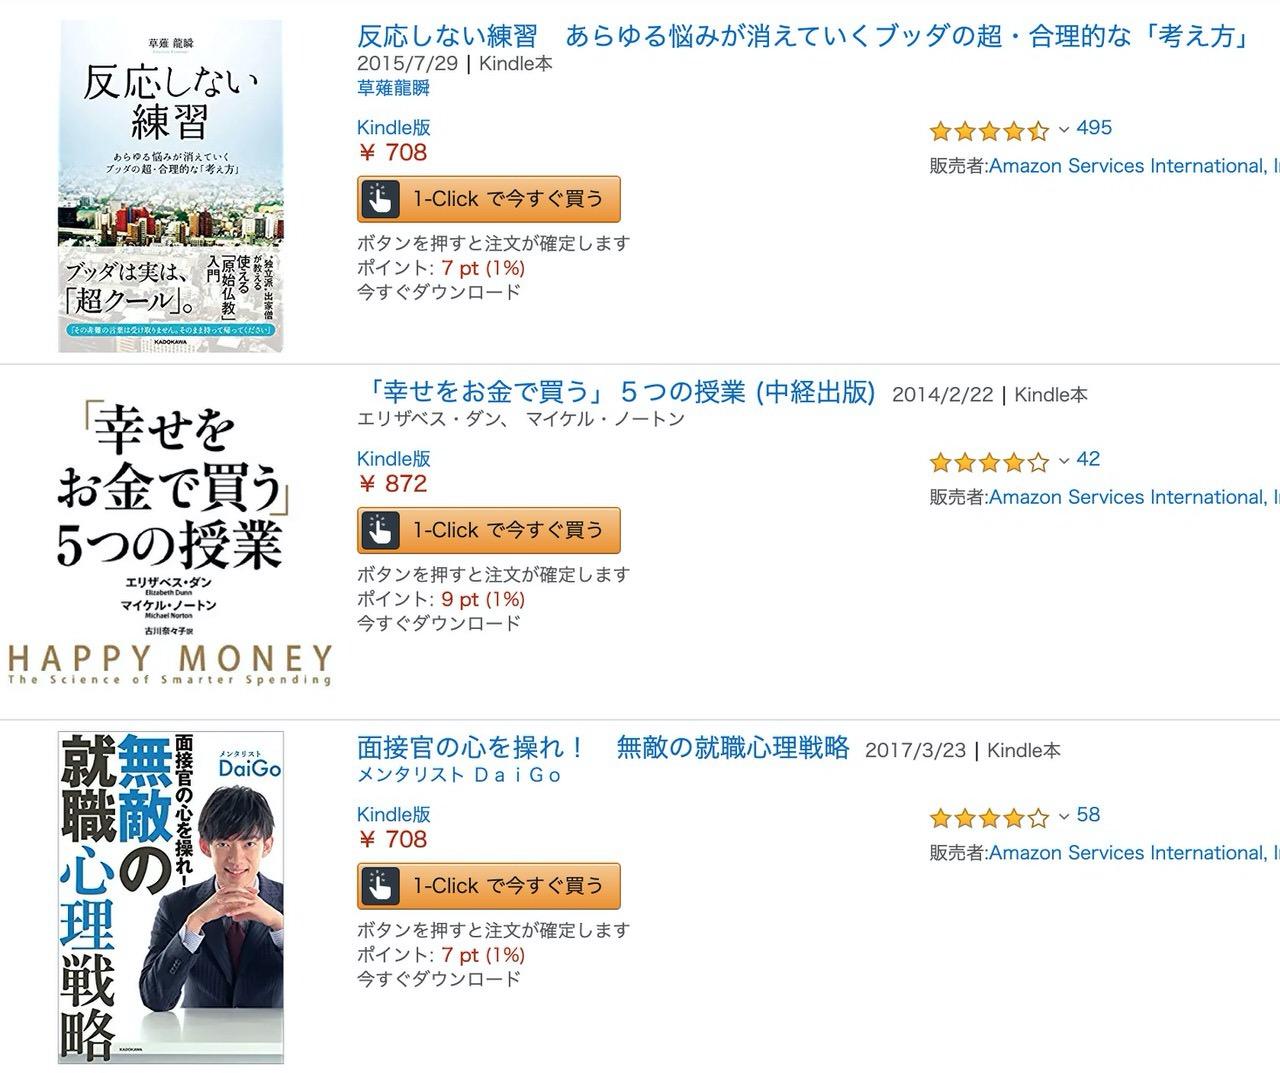 【Kindleセール】ライフハック大全・100円のコーラを1000円で売る方法など1,000冊以上が対象「KADOKAWA春の新スタート応援フェア」開催中(4/2まで)